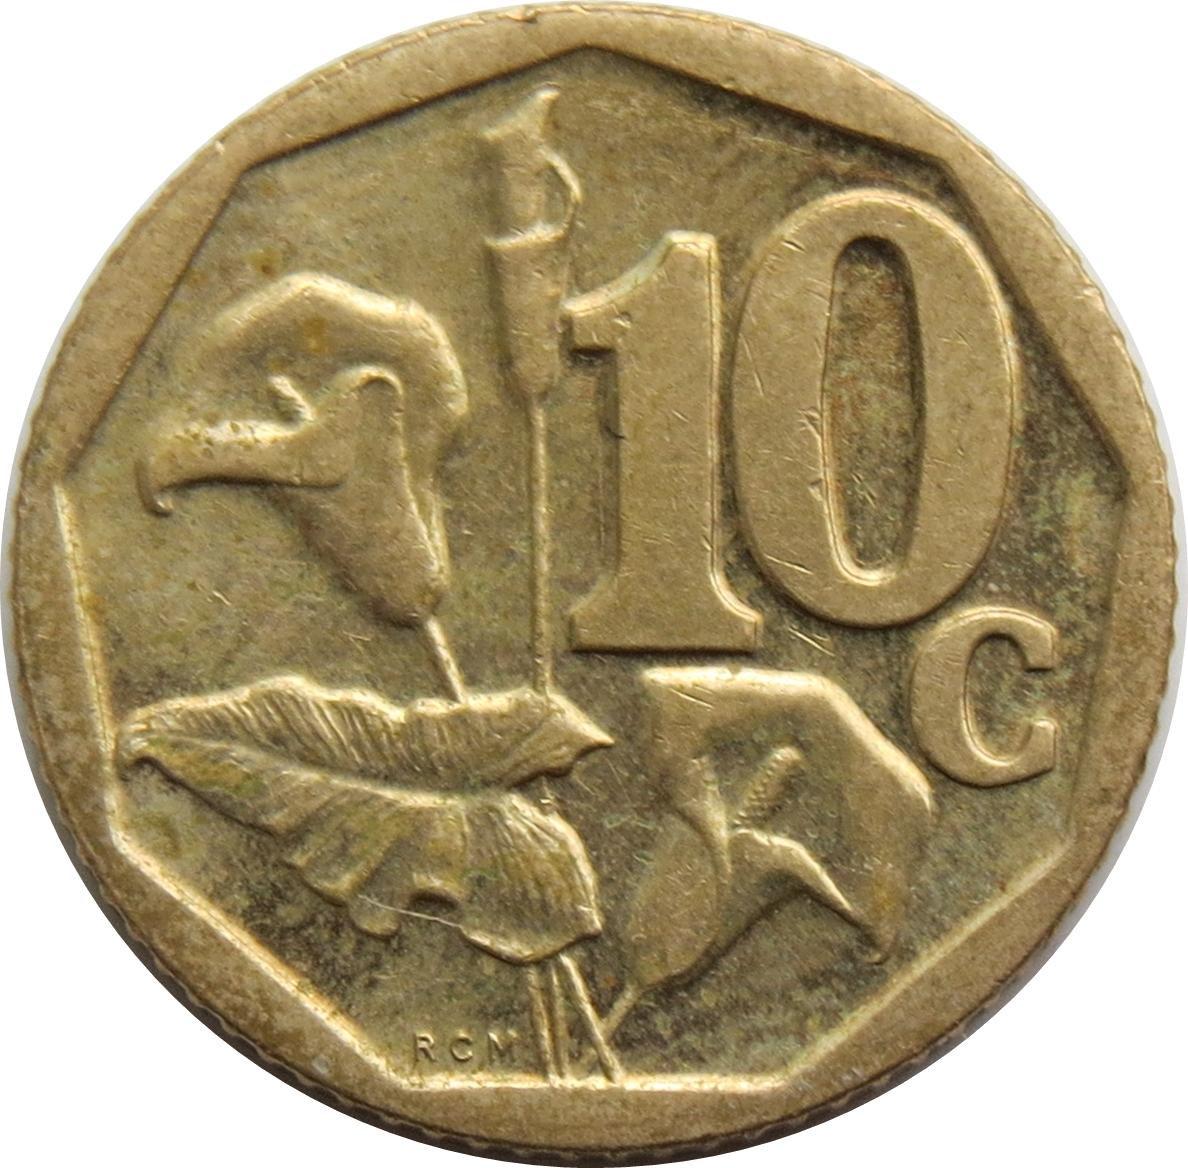 10 Cents (Venda Legend - Afurika Tshipembe) - South Africa ...